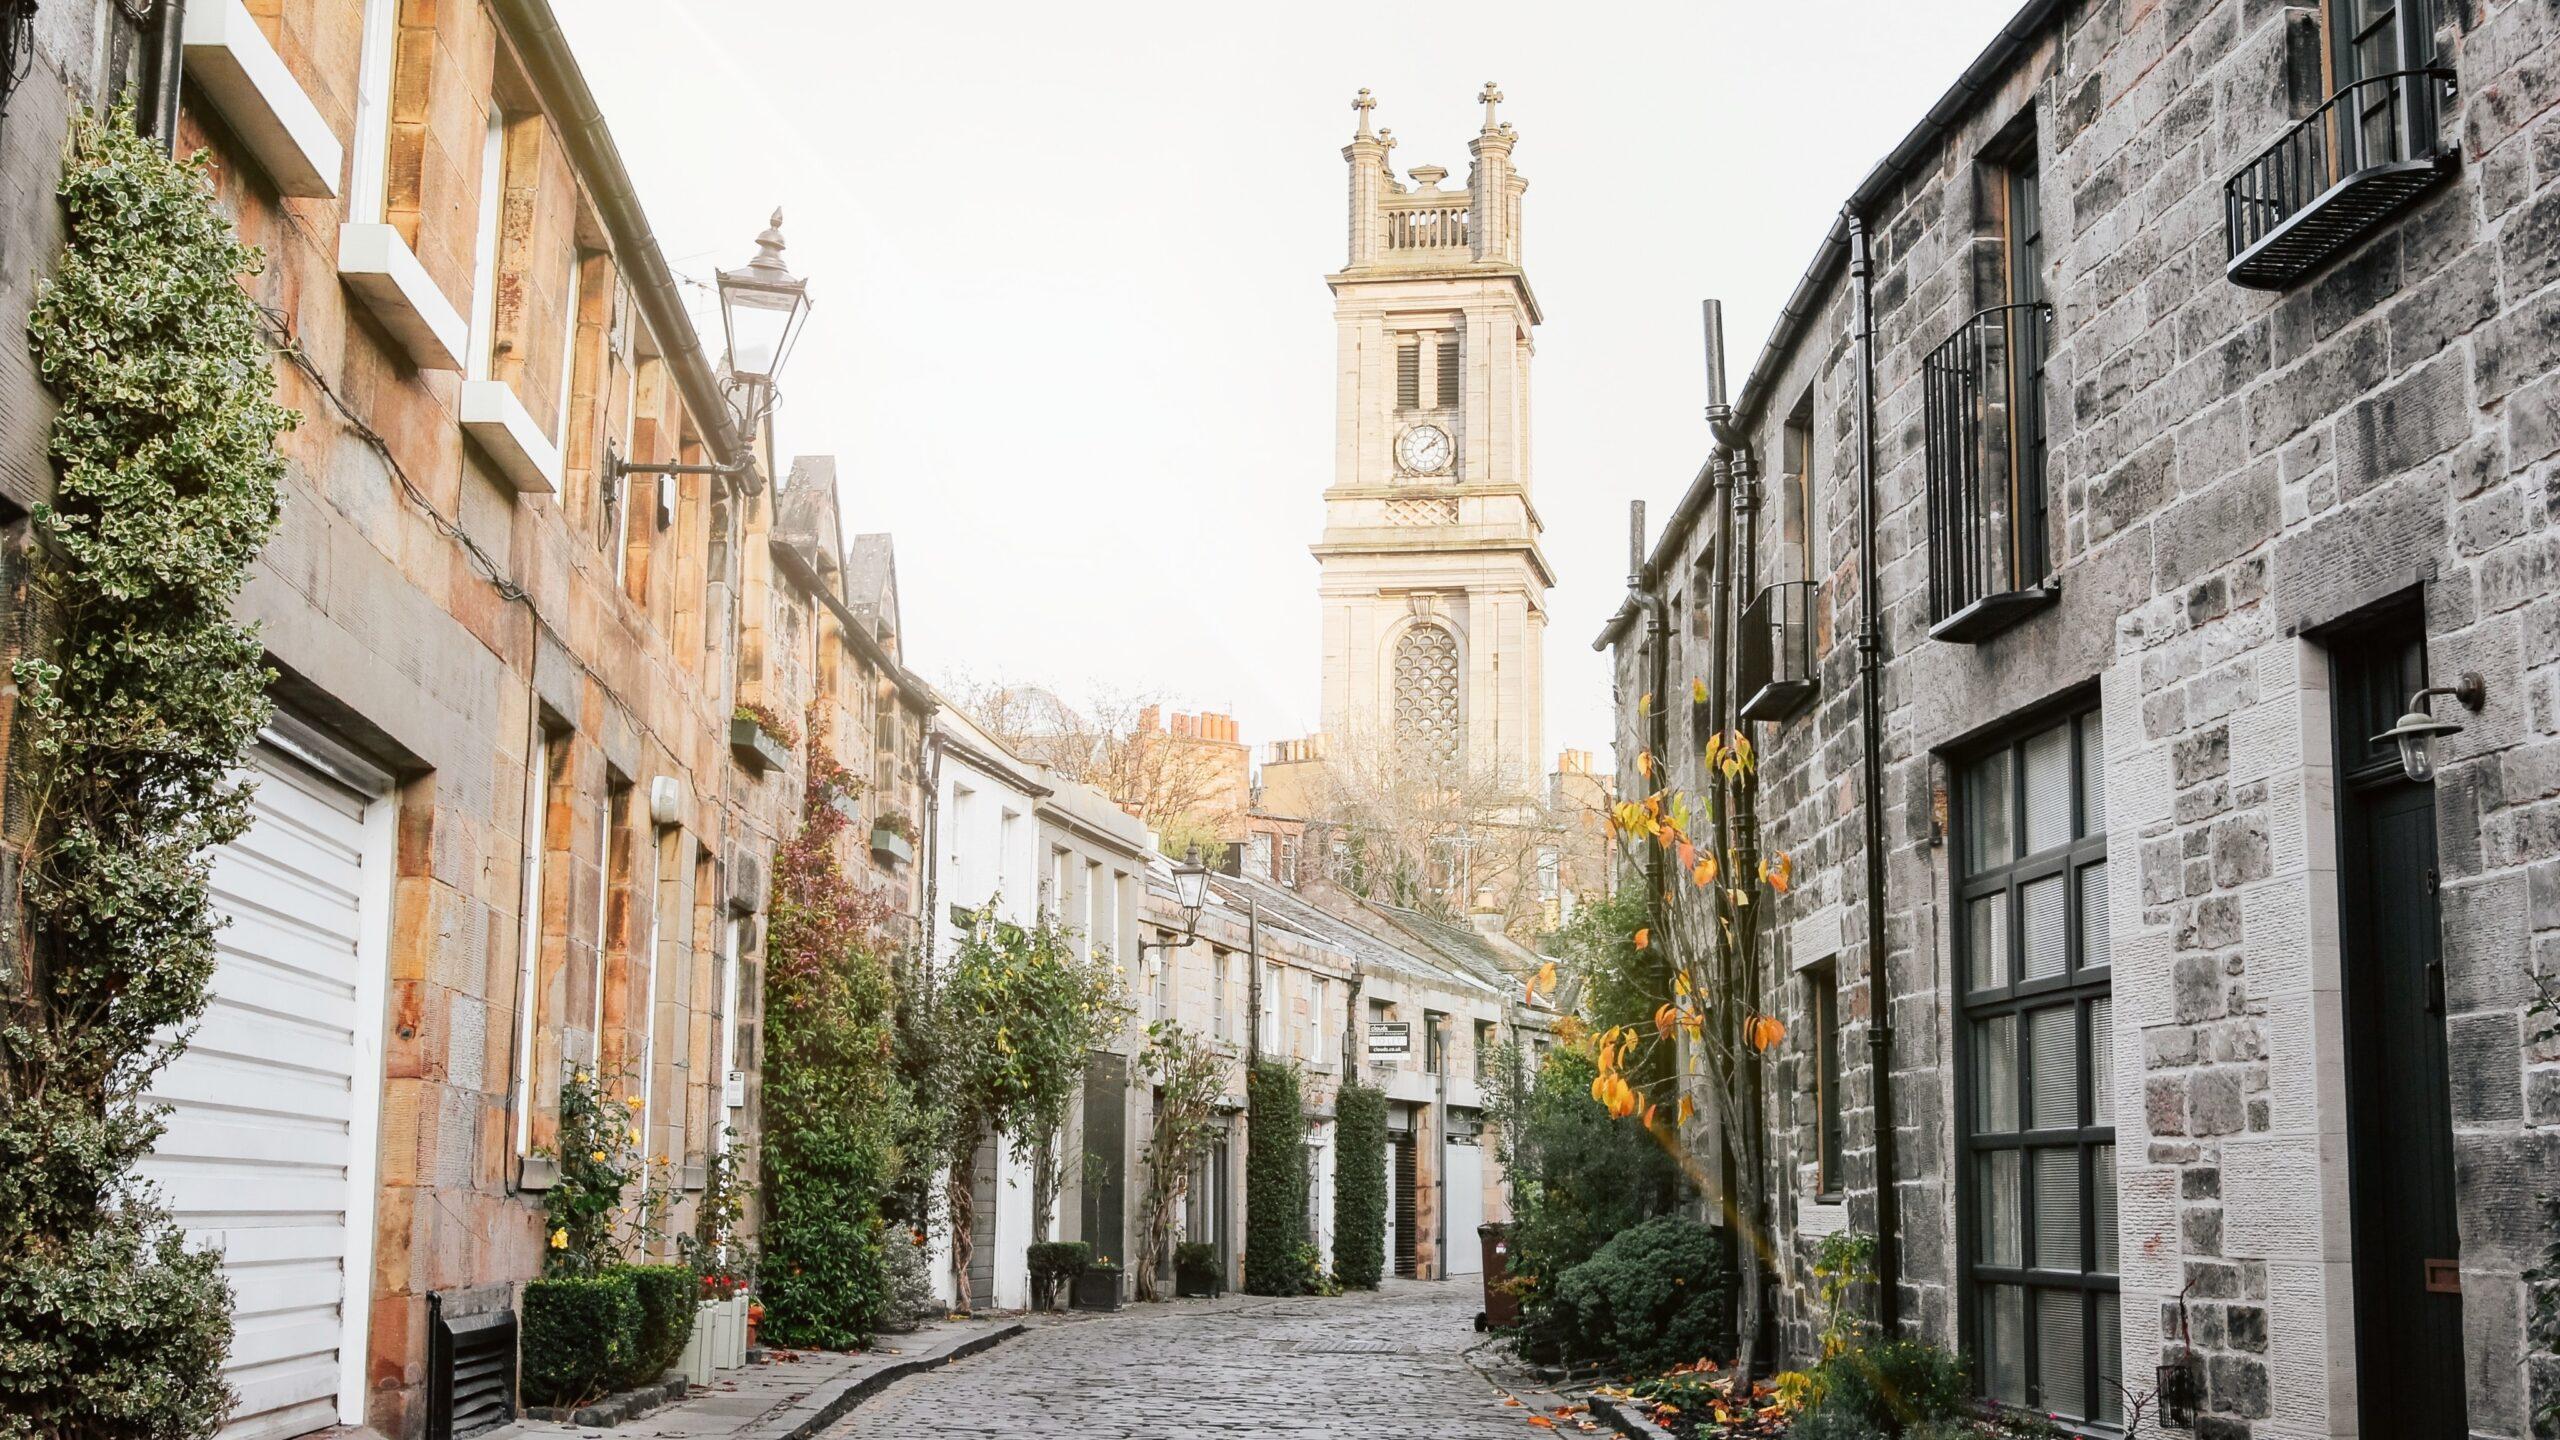 Cute street in British town